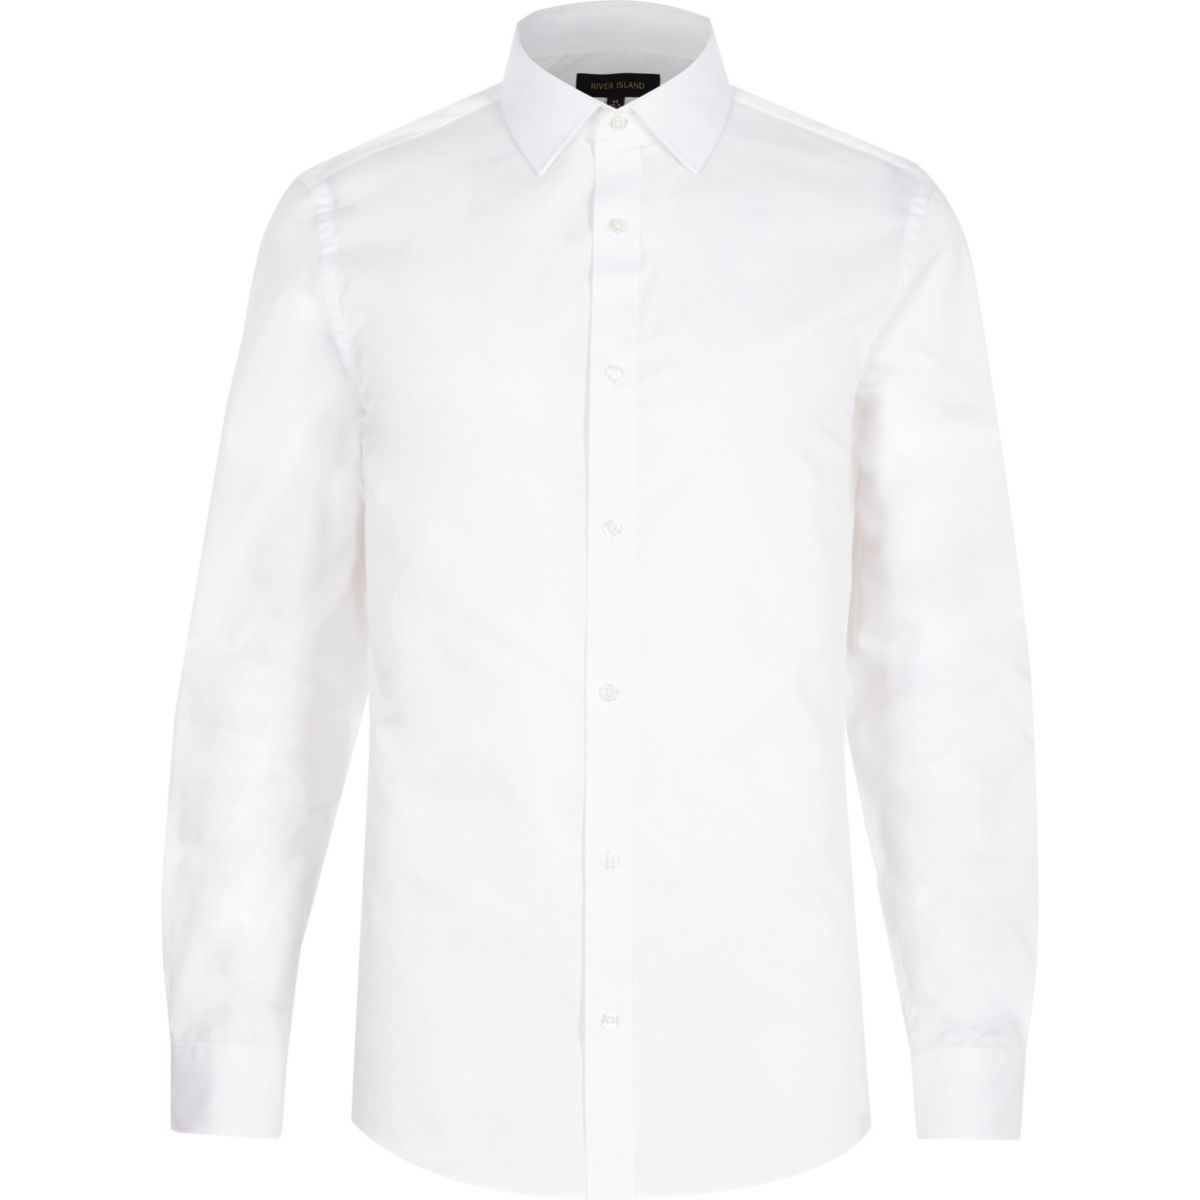 White twill long sleeve slim fit shirt